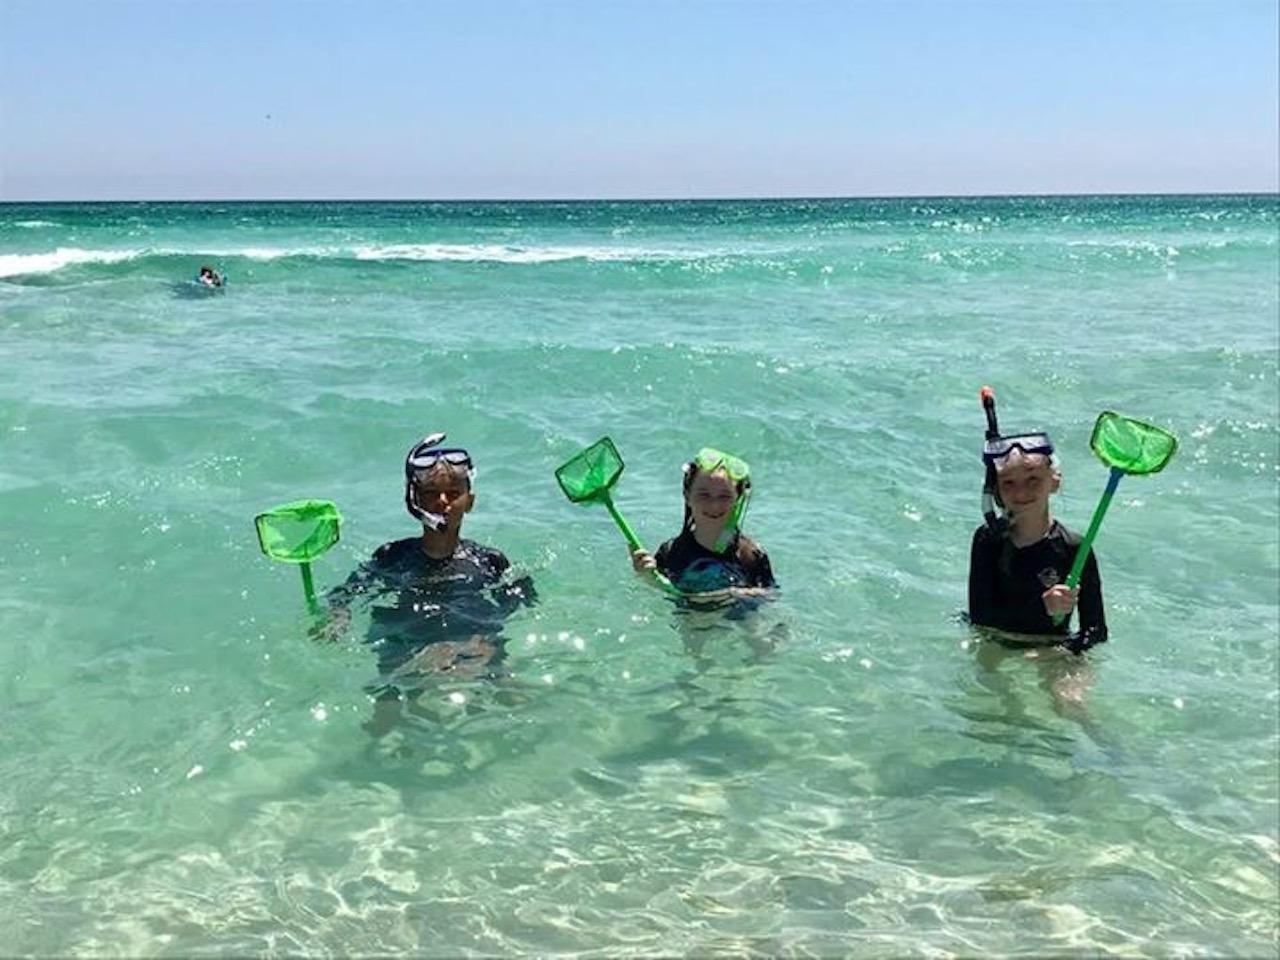 Snorkling on the beach behind Corona Del Mar